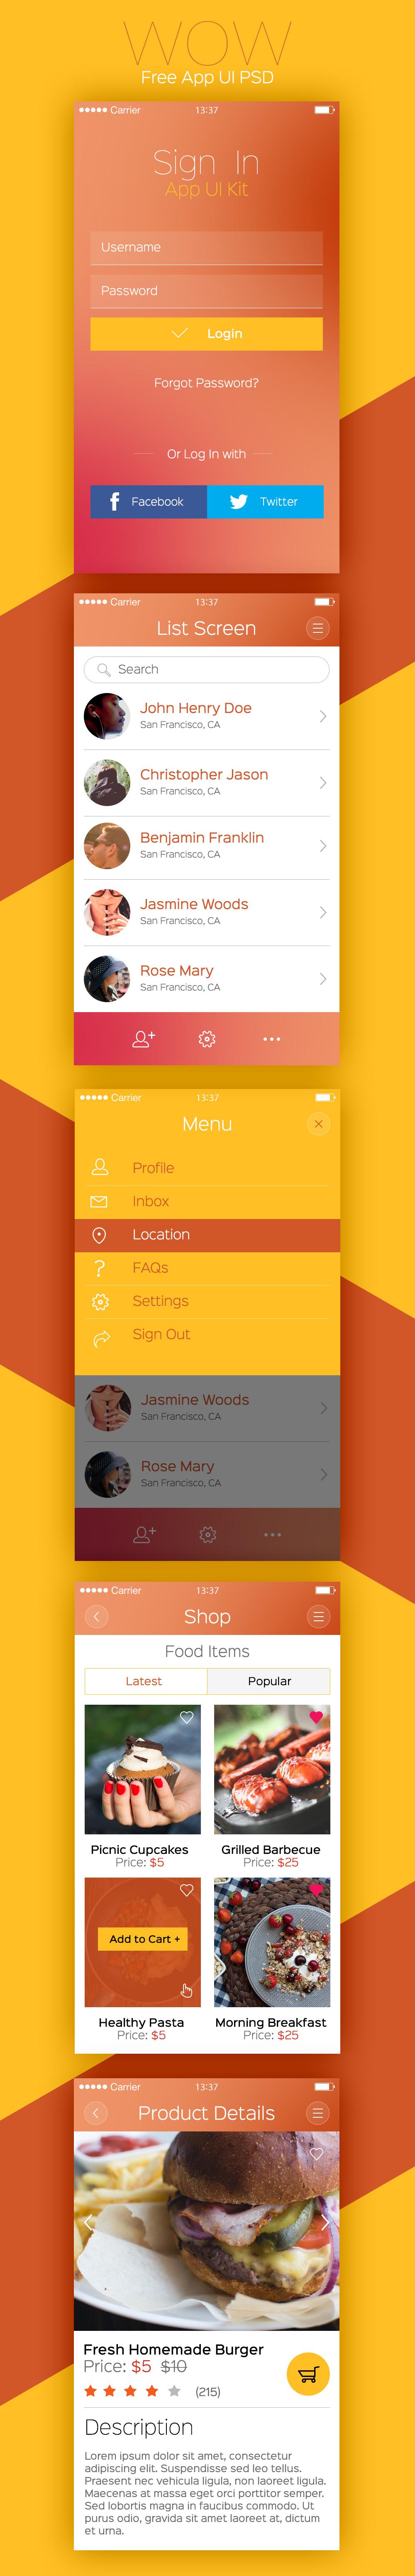 free-app-ui-psd-fullview